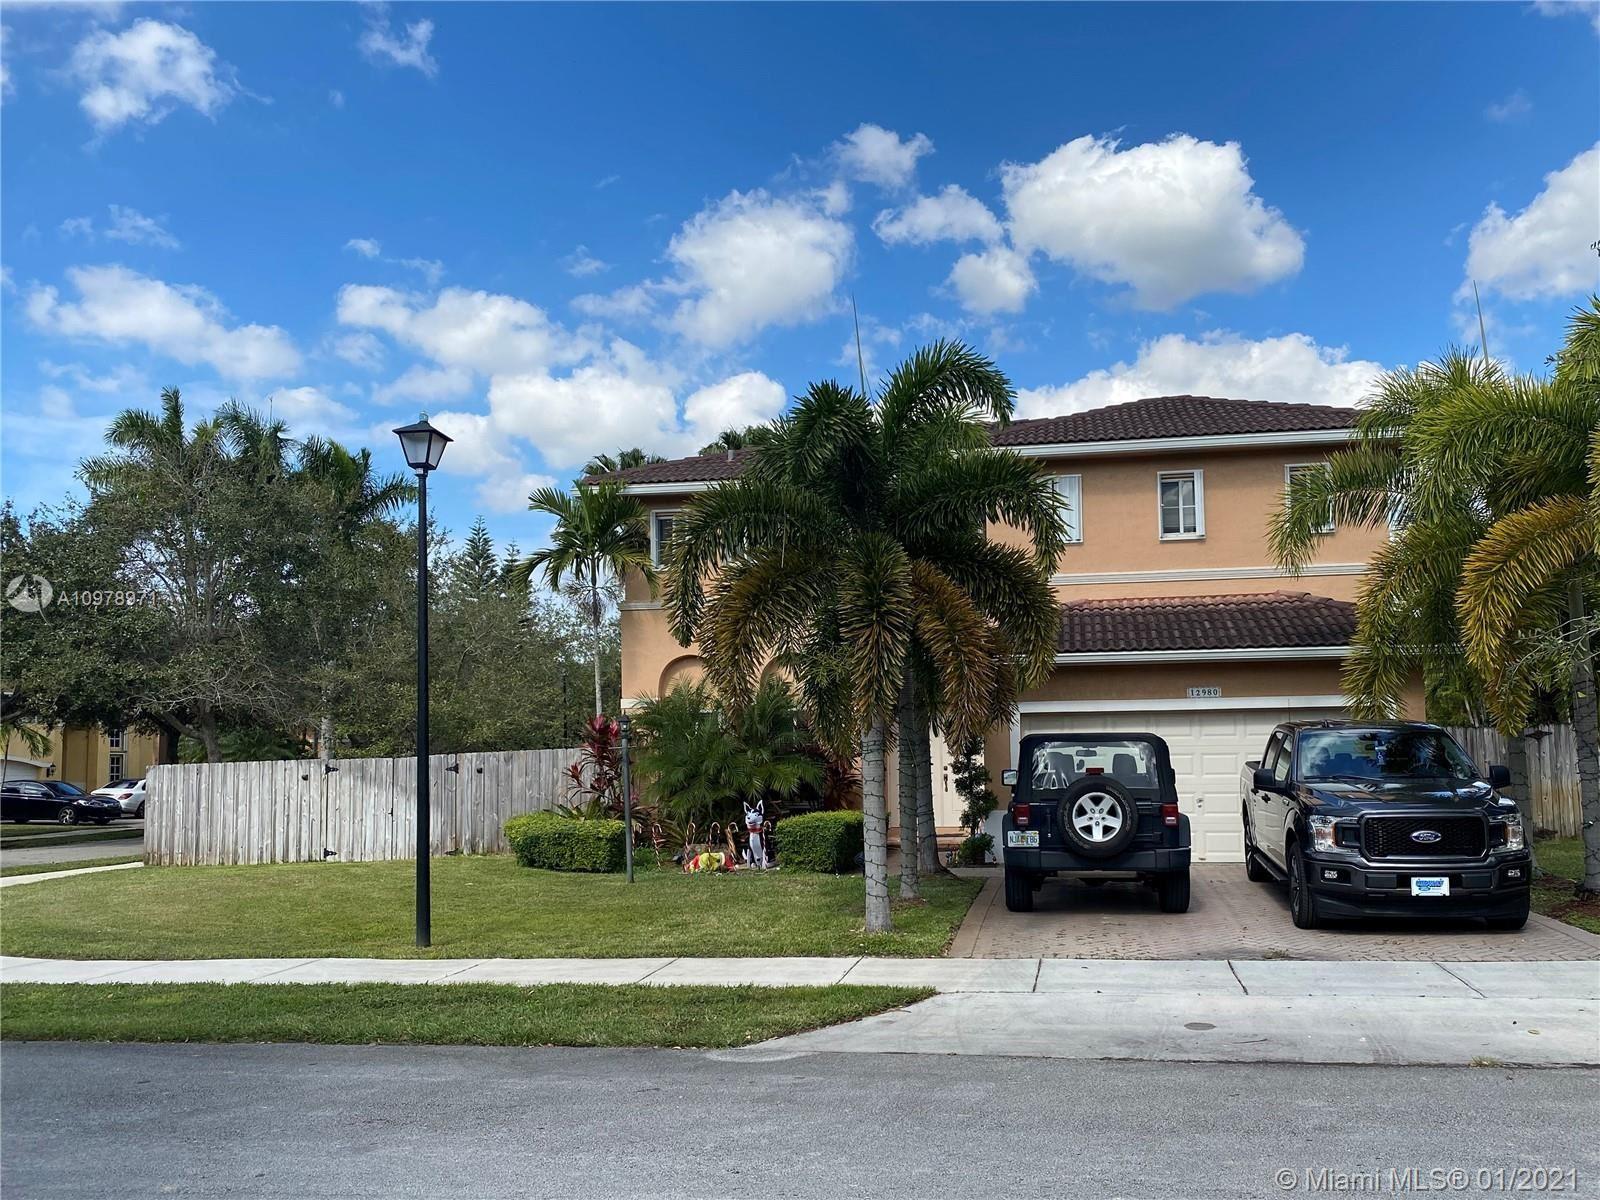 12980 SW 142nd Ter, Miami, FL 33186 - #: A10978971